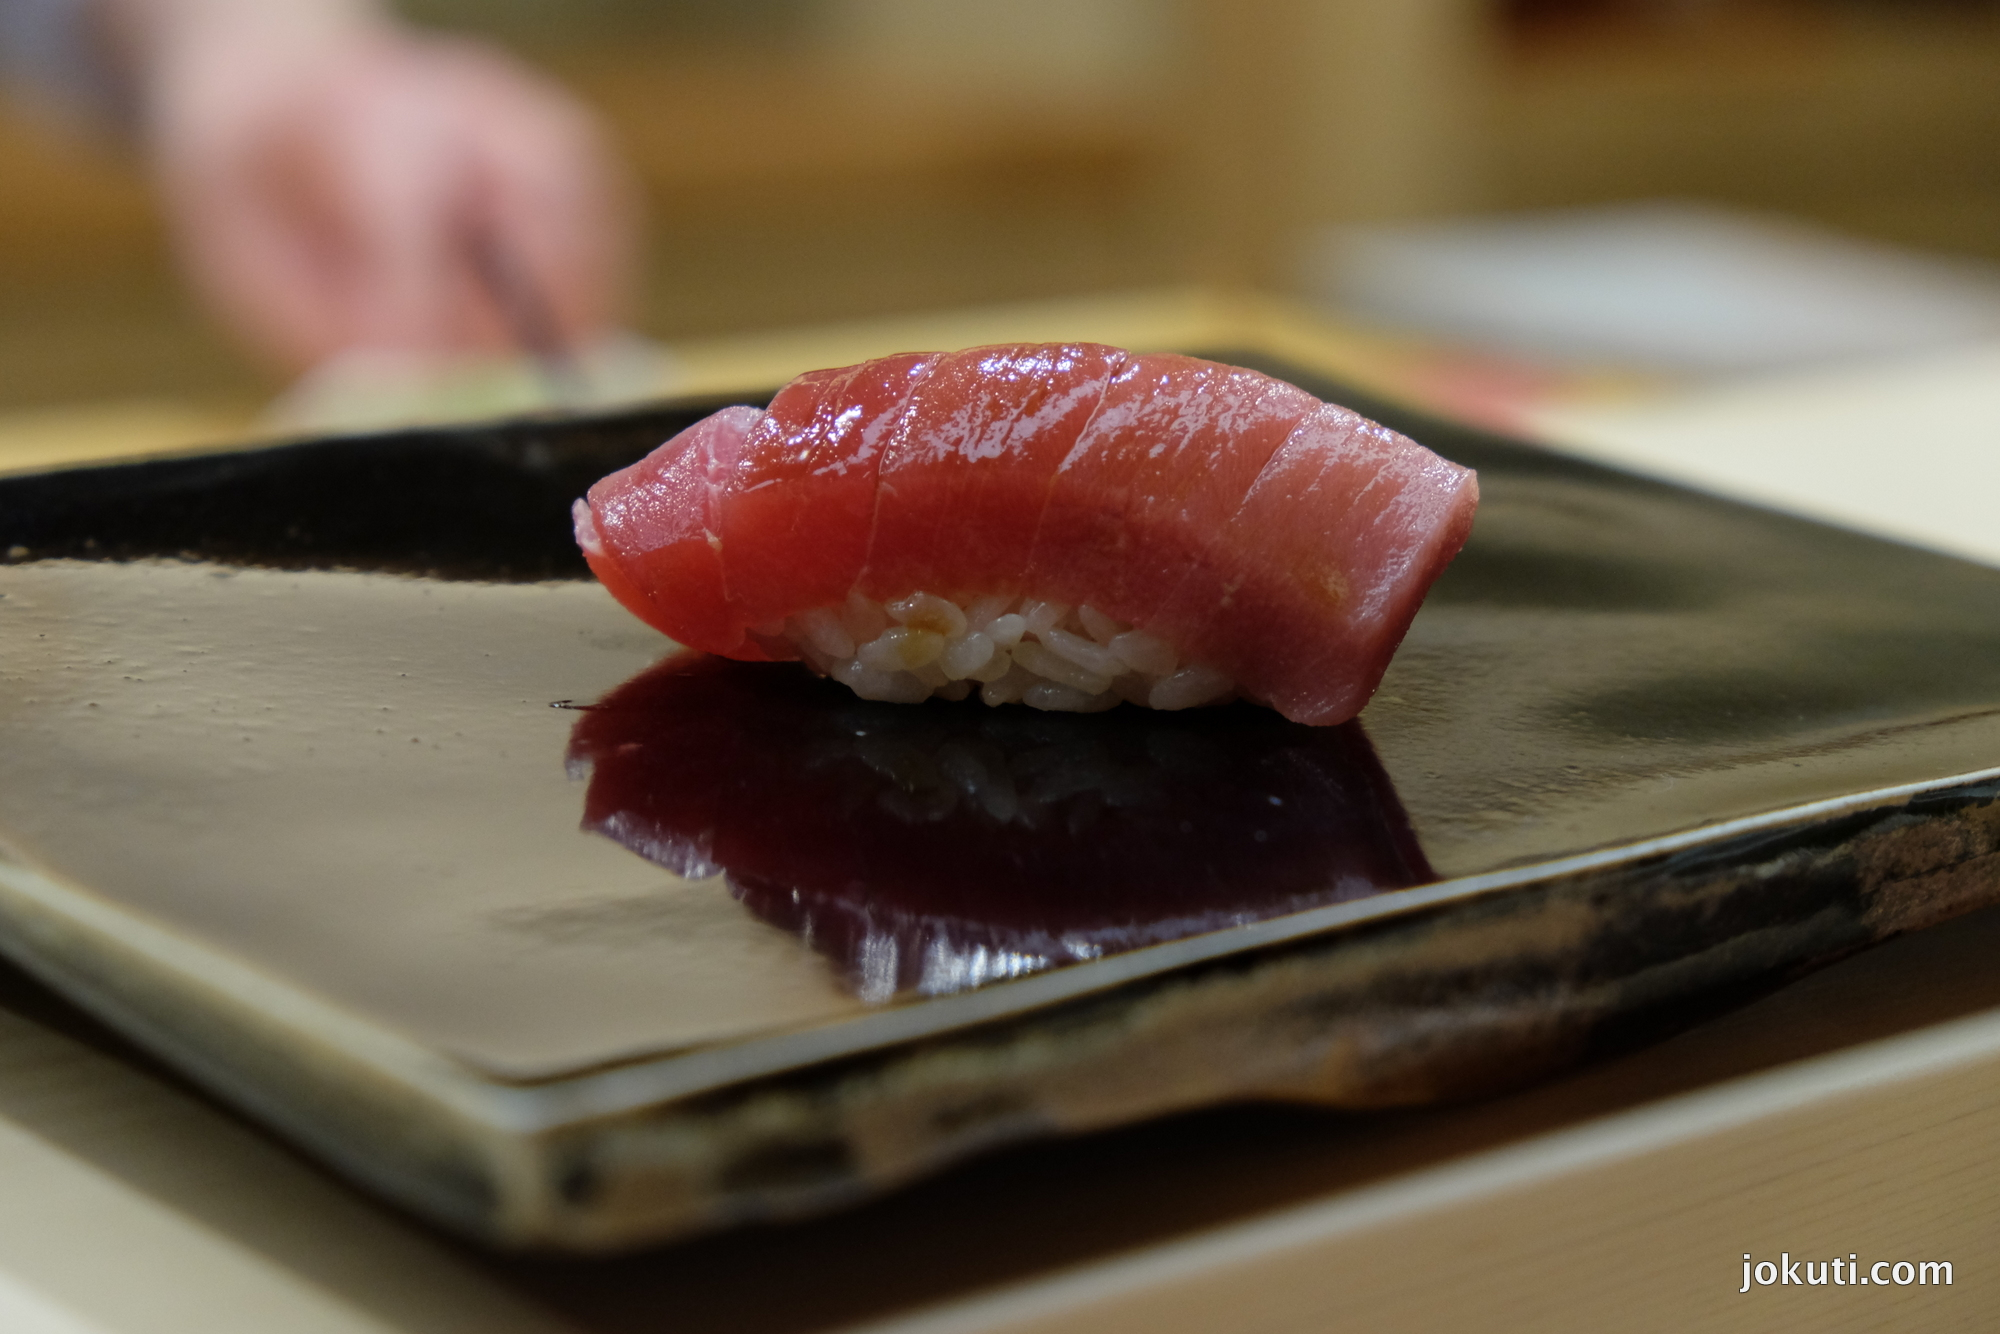 dscf5577_sugita_sushi_michelin_tokyo_japan_vilagevo_jokuti.jpg